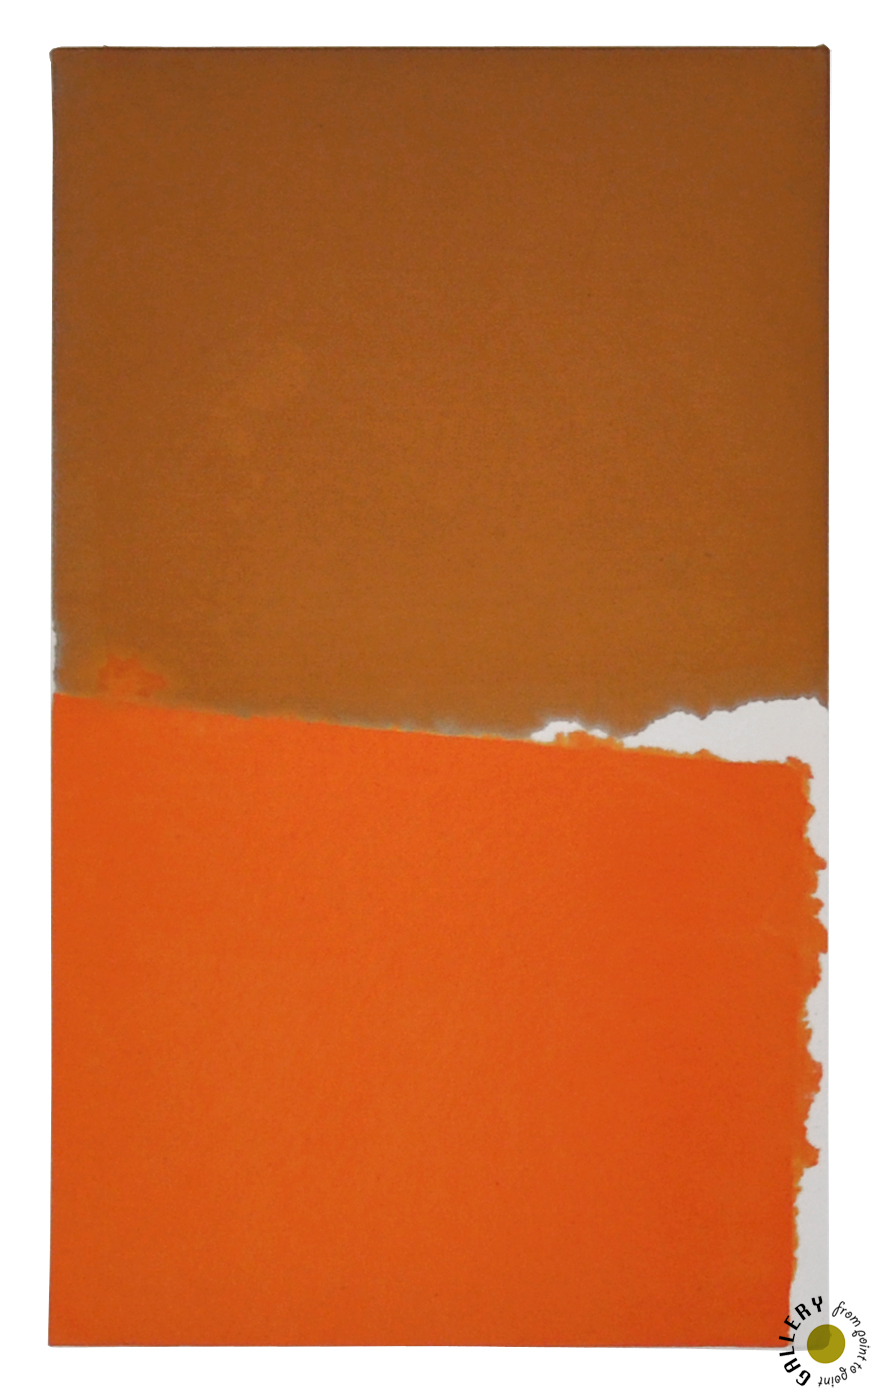 Guillaume-Moschini-Peinture-Ocre-Orange